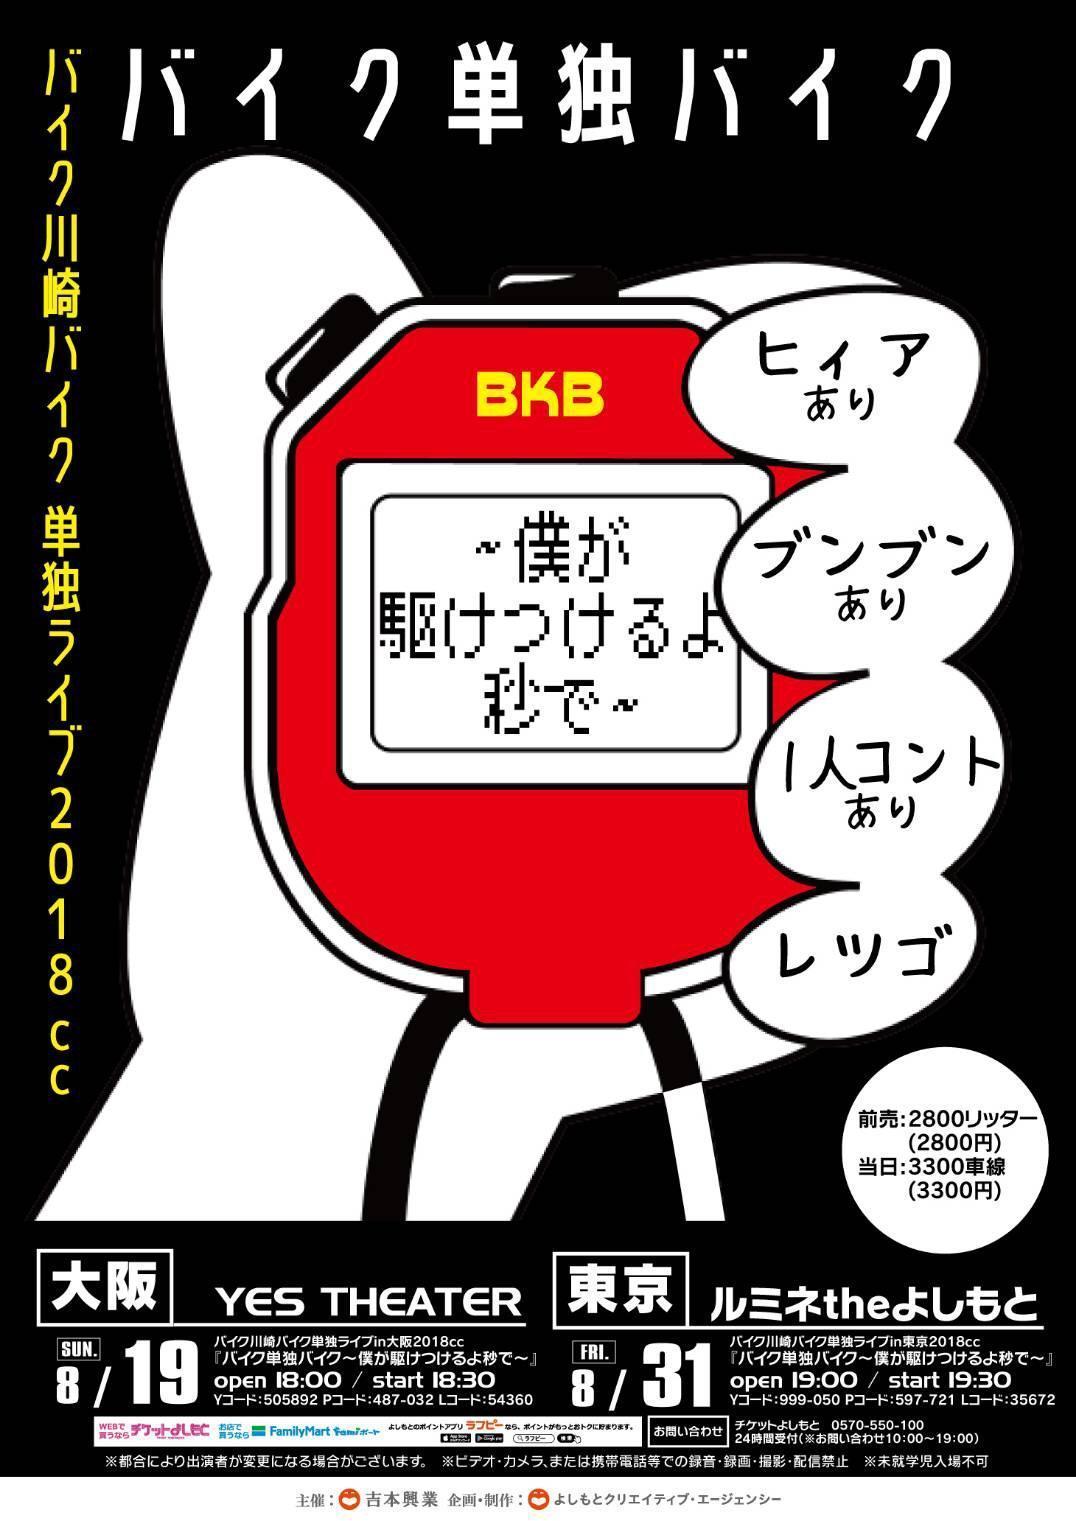 http://news.yoshimoto.co.jp/20180515140101-06281793423cd647fce8d2e83809cc8fcb8058da.jpg